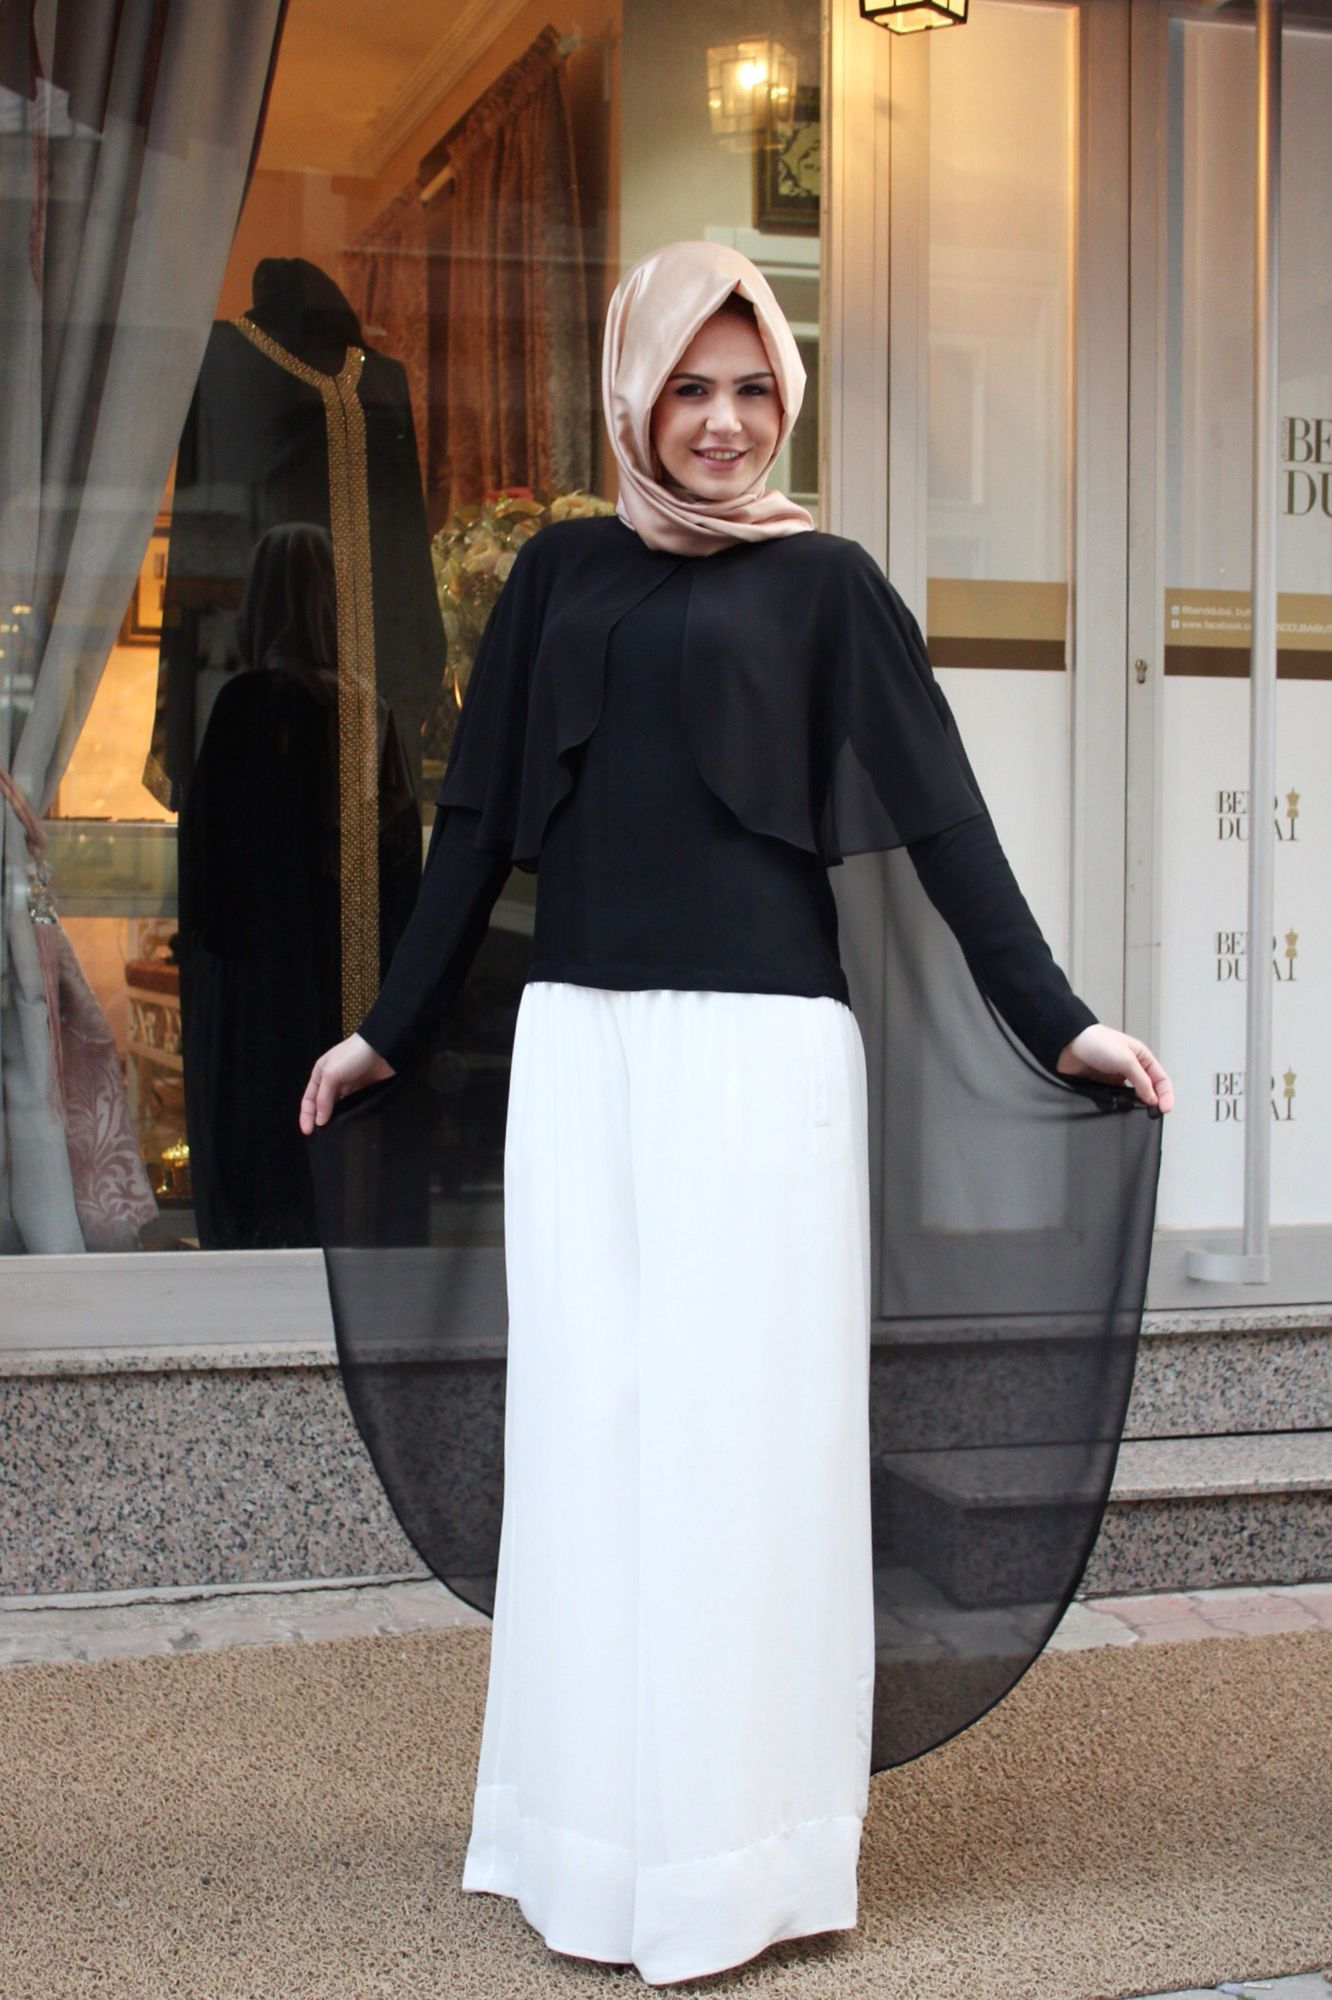 Tesettur Giyim Bluz Modelleri Bend Dubai Butik Bluz Modelleri Www Benddubaibutik Com Dubai Ve Turkiyeden S Fashion Forward Outfits Muslim Fashion Hijab Fashion